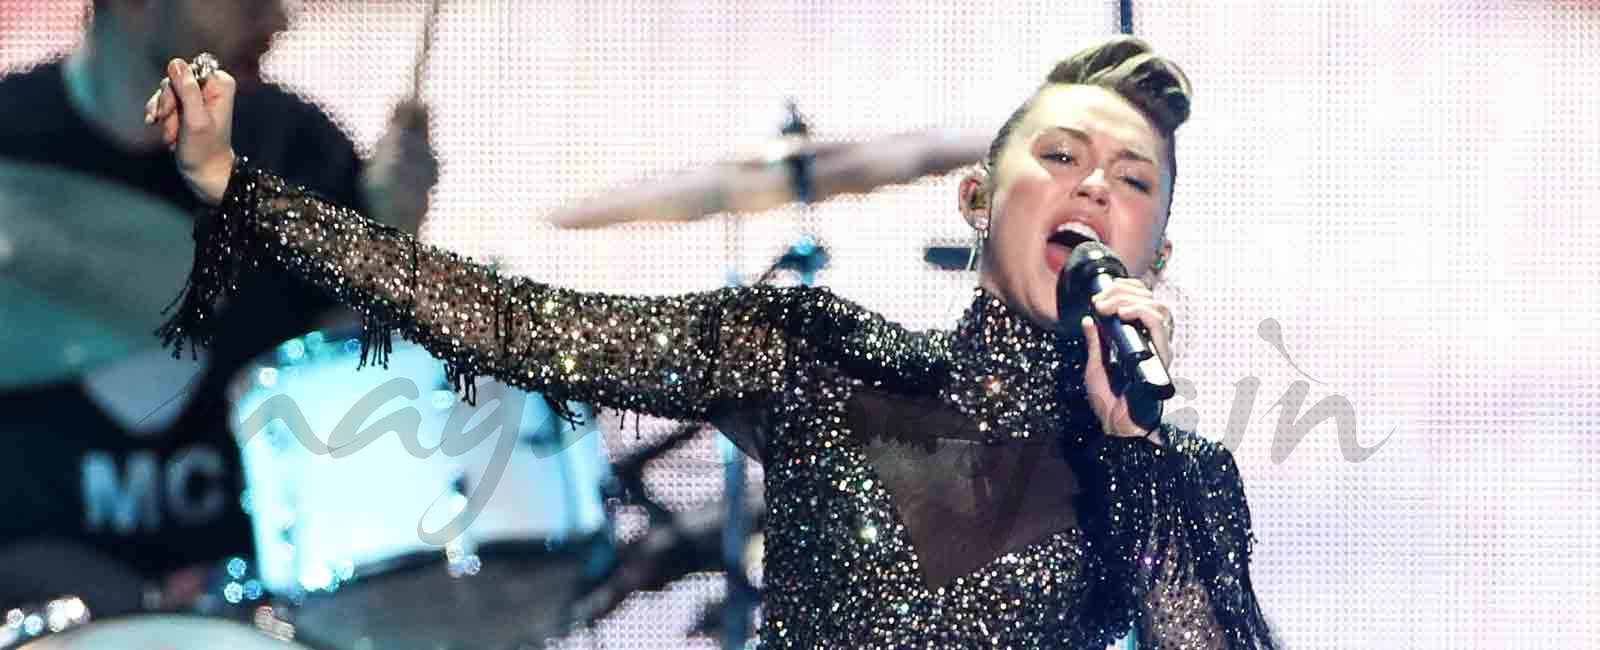 Así era, Así son: Miley Cyrus 2007-2017